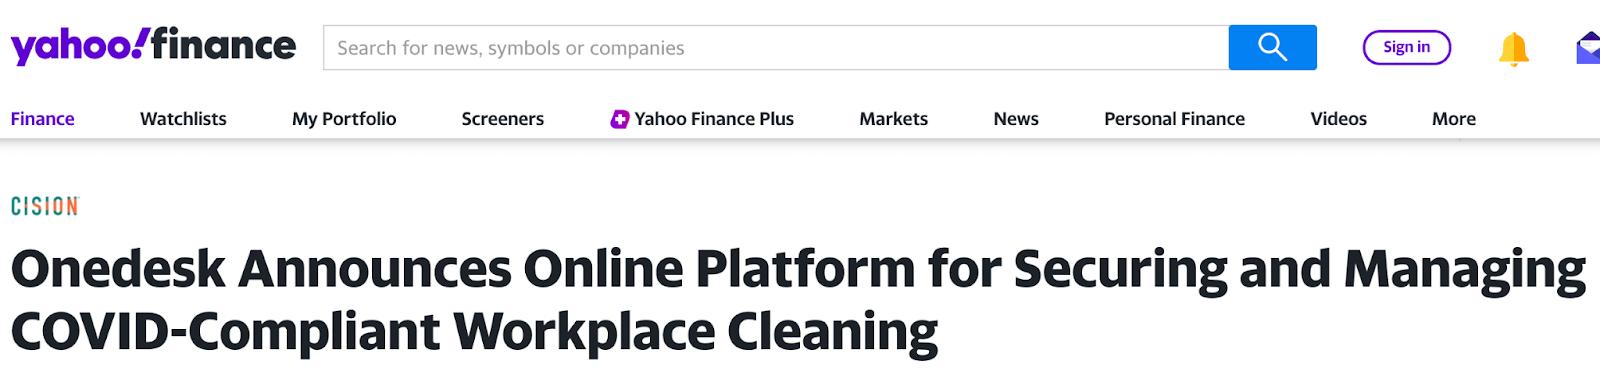 onedesk cleaning app on yahoo finance website